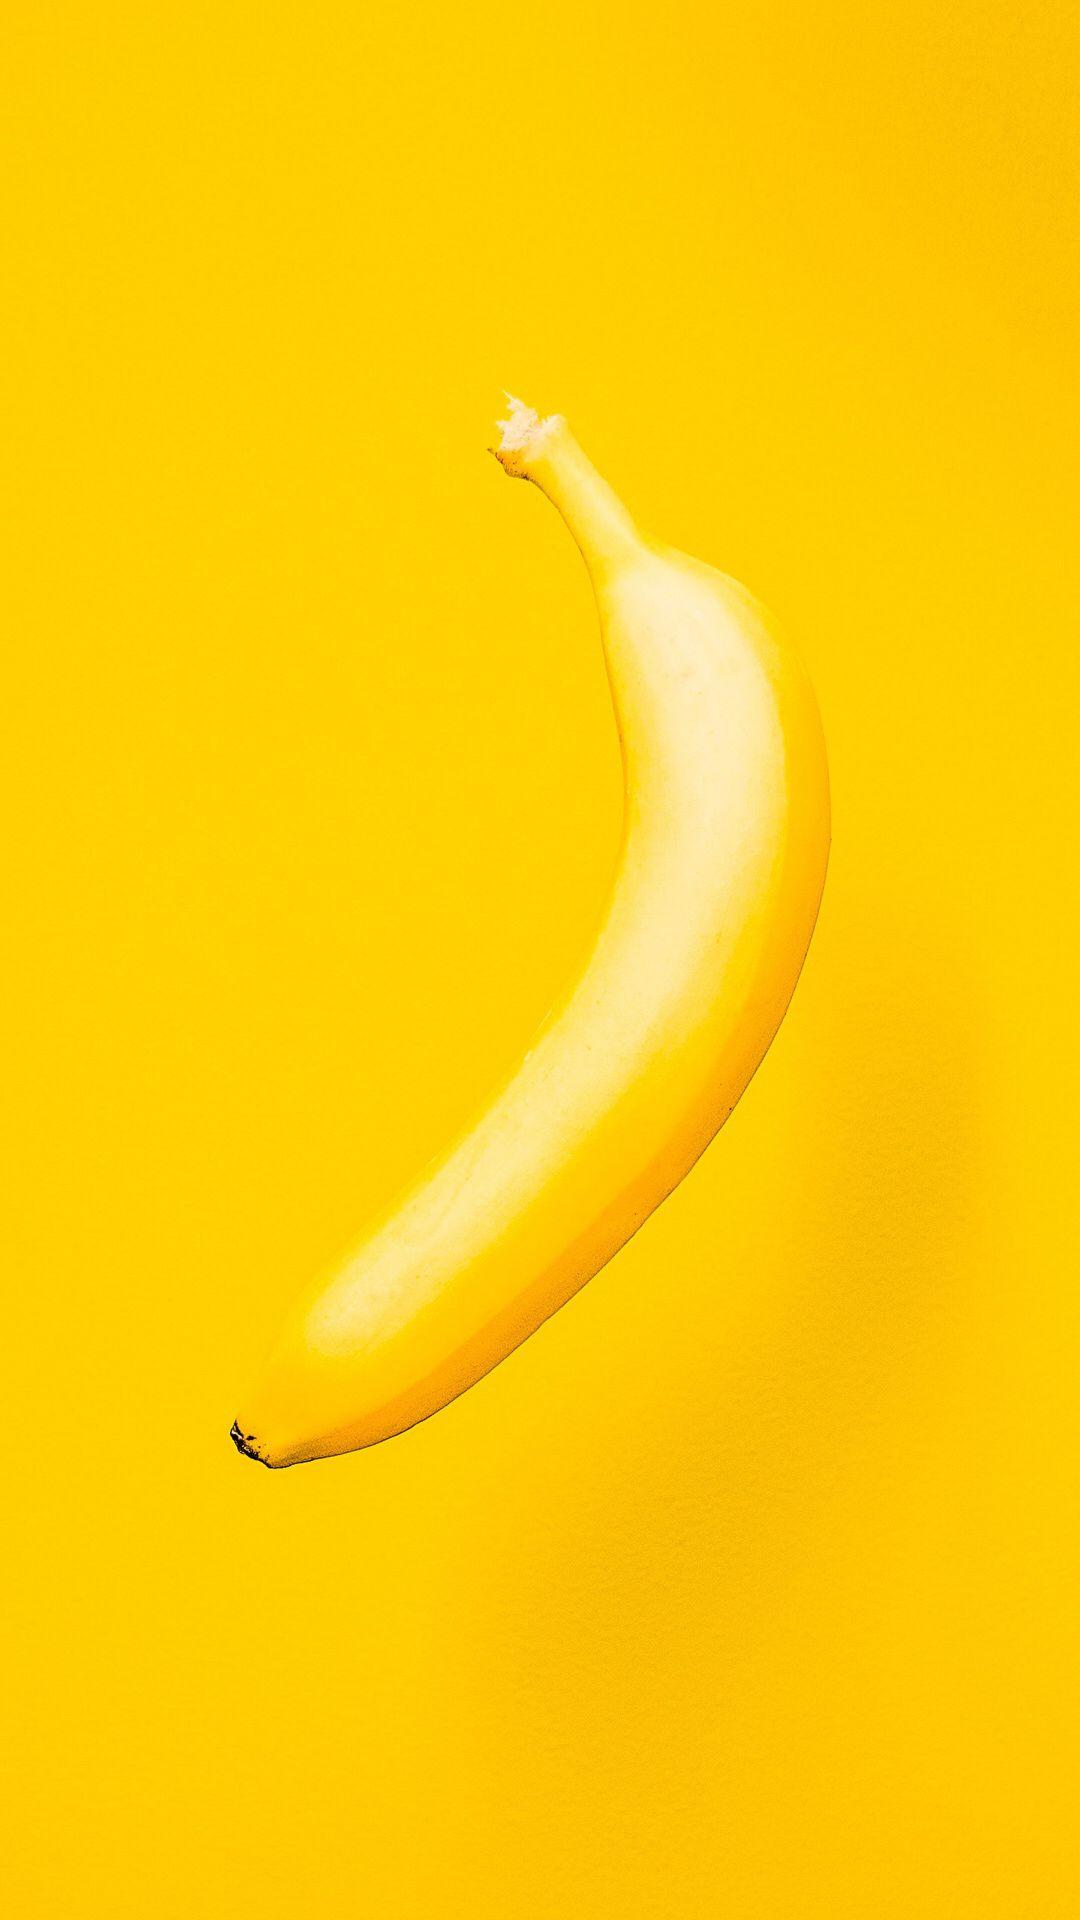 Banana Yellow Banana Wallpaper Banana Banana Art